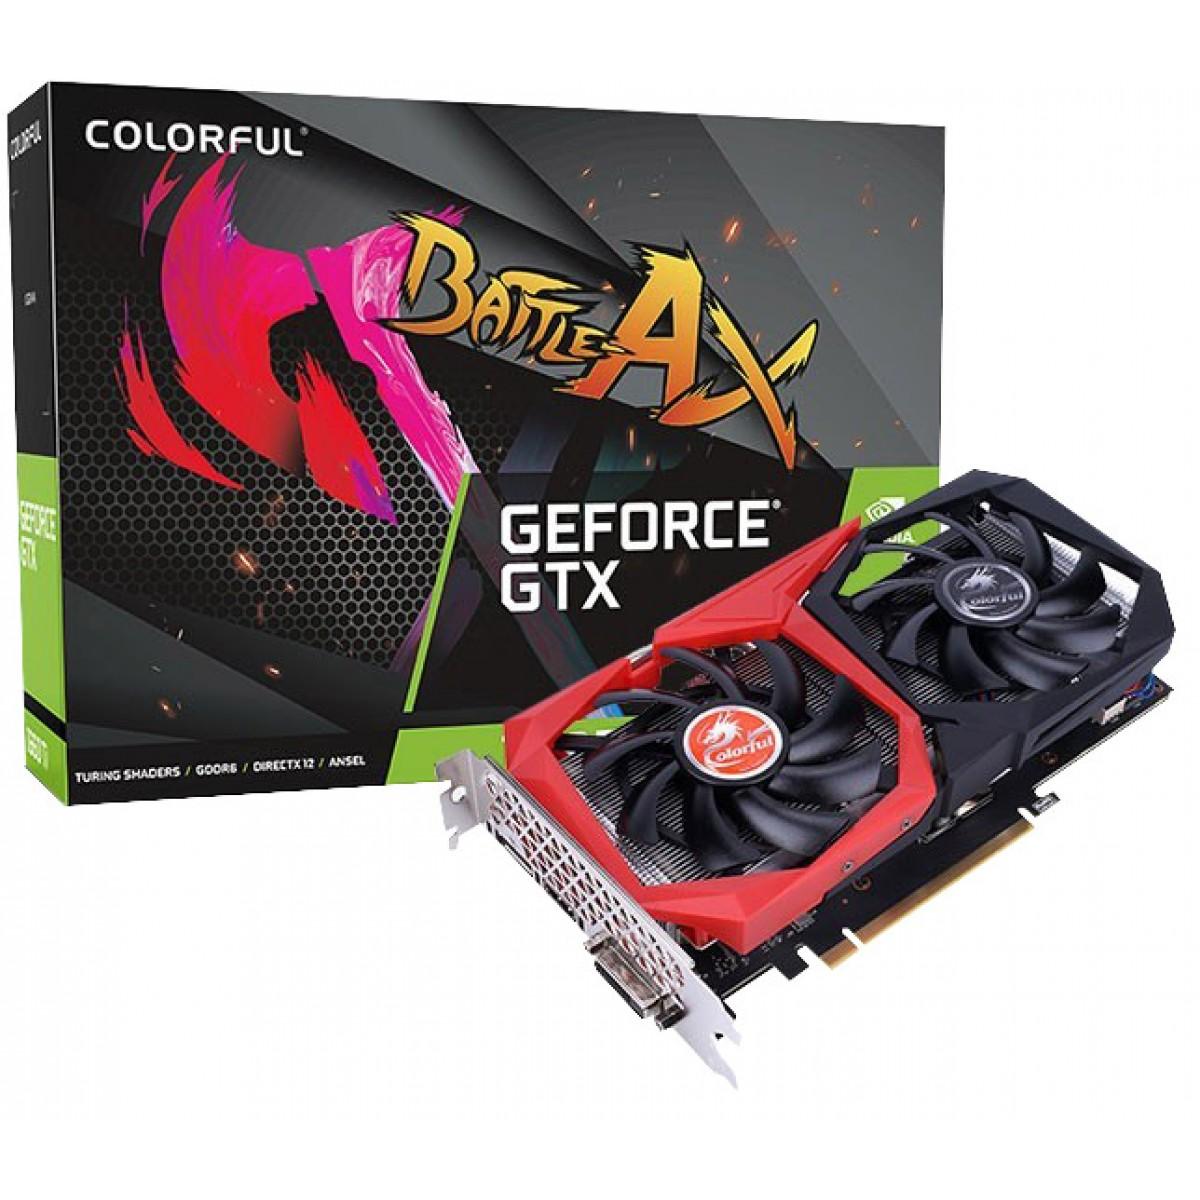 Placa de Vídeo Colorful GeForce GTX 1660 NB 6G-V Dual, 6GB GDDR5, 192Bit